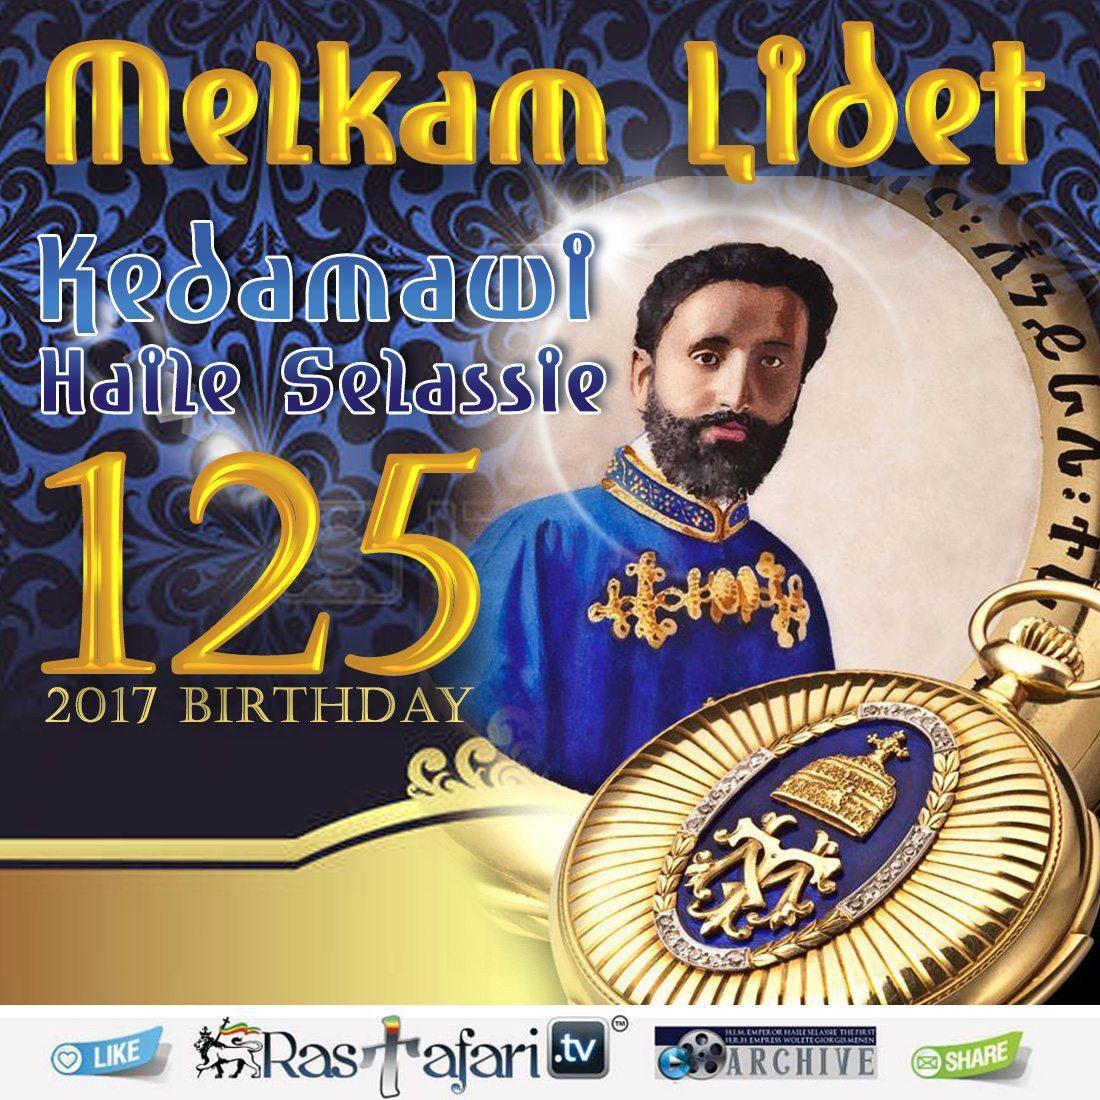 Quasquicentennial of Kedāmāwī Haile Sellassie 125 Lidet / Birthday